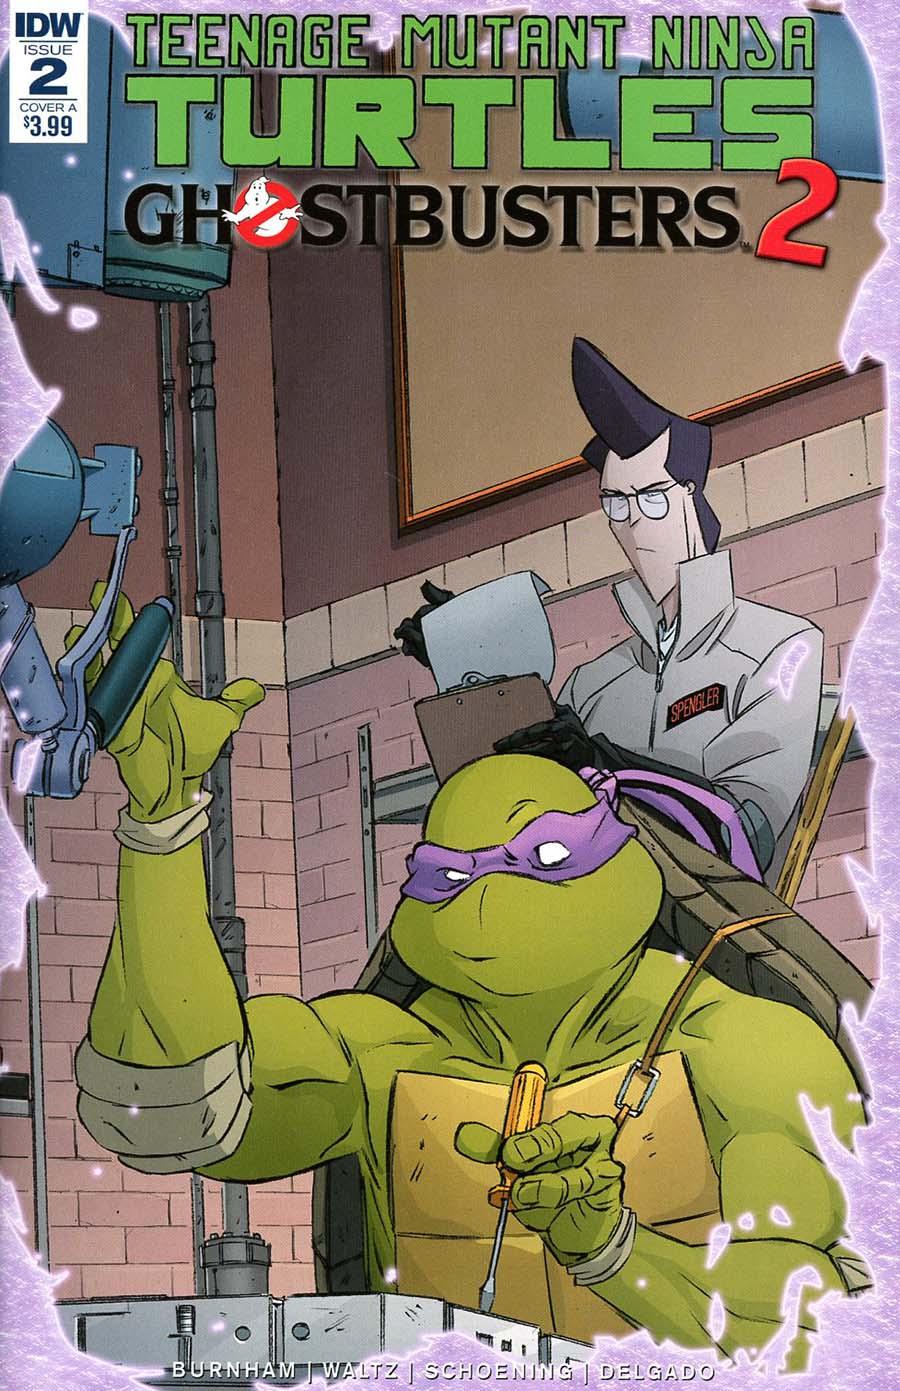 Teenage Mutant Ninja Turtles Ghostbusters II #2 Cover A Regular Dan Schoening Cover